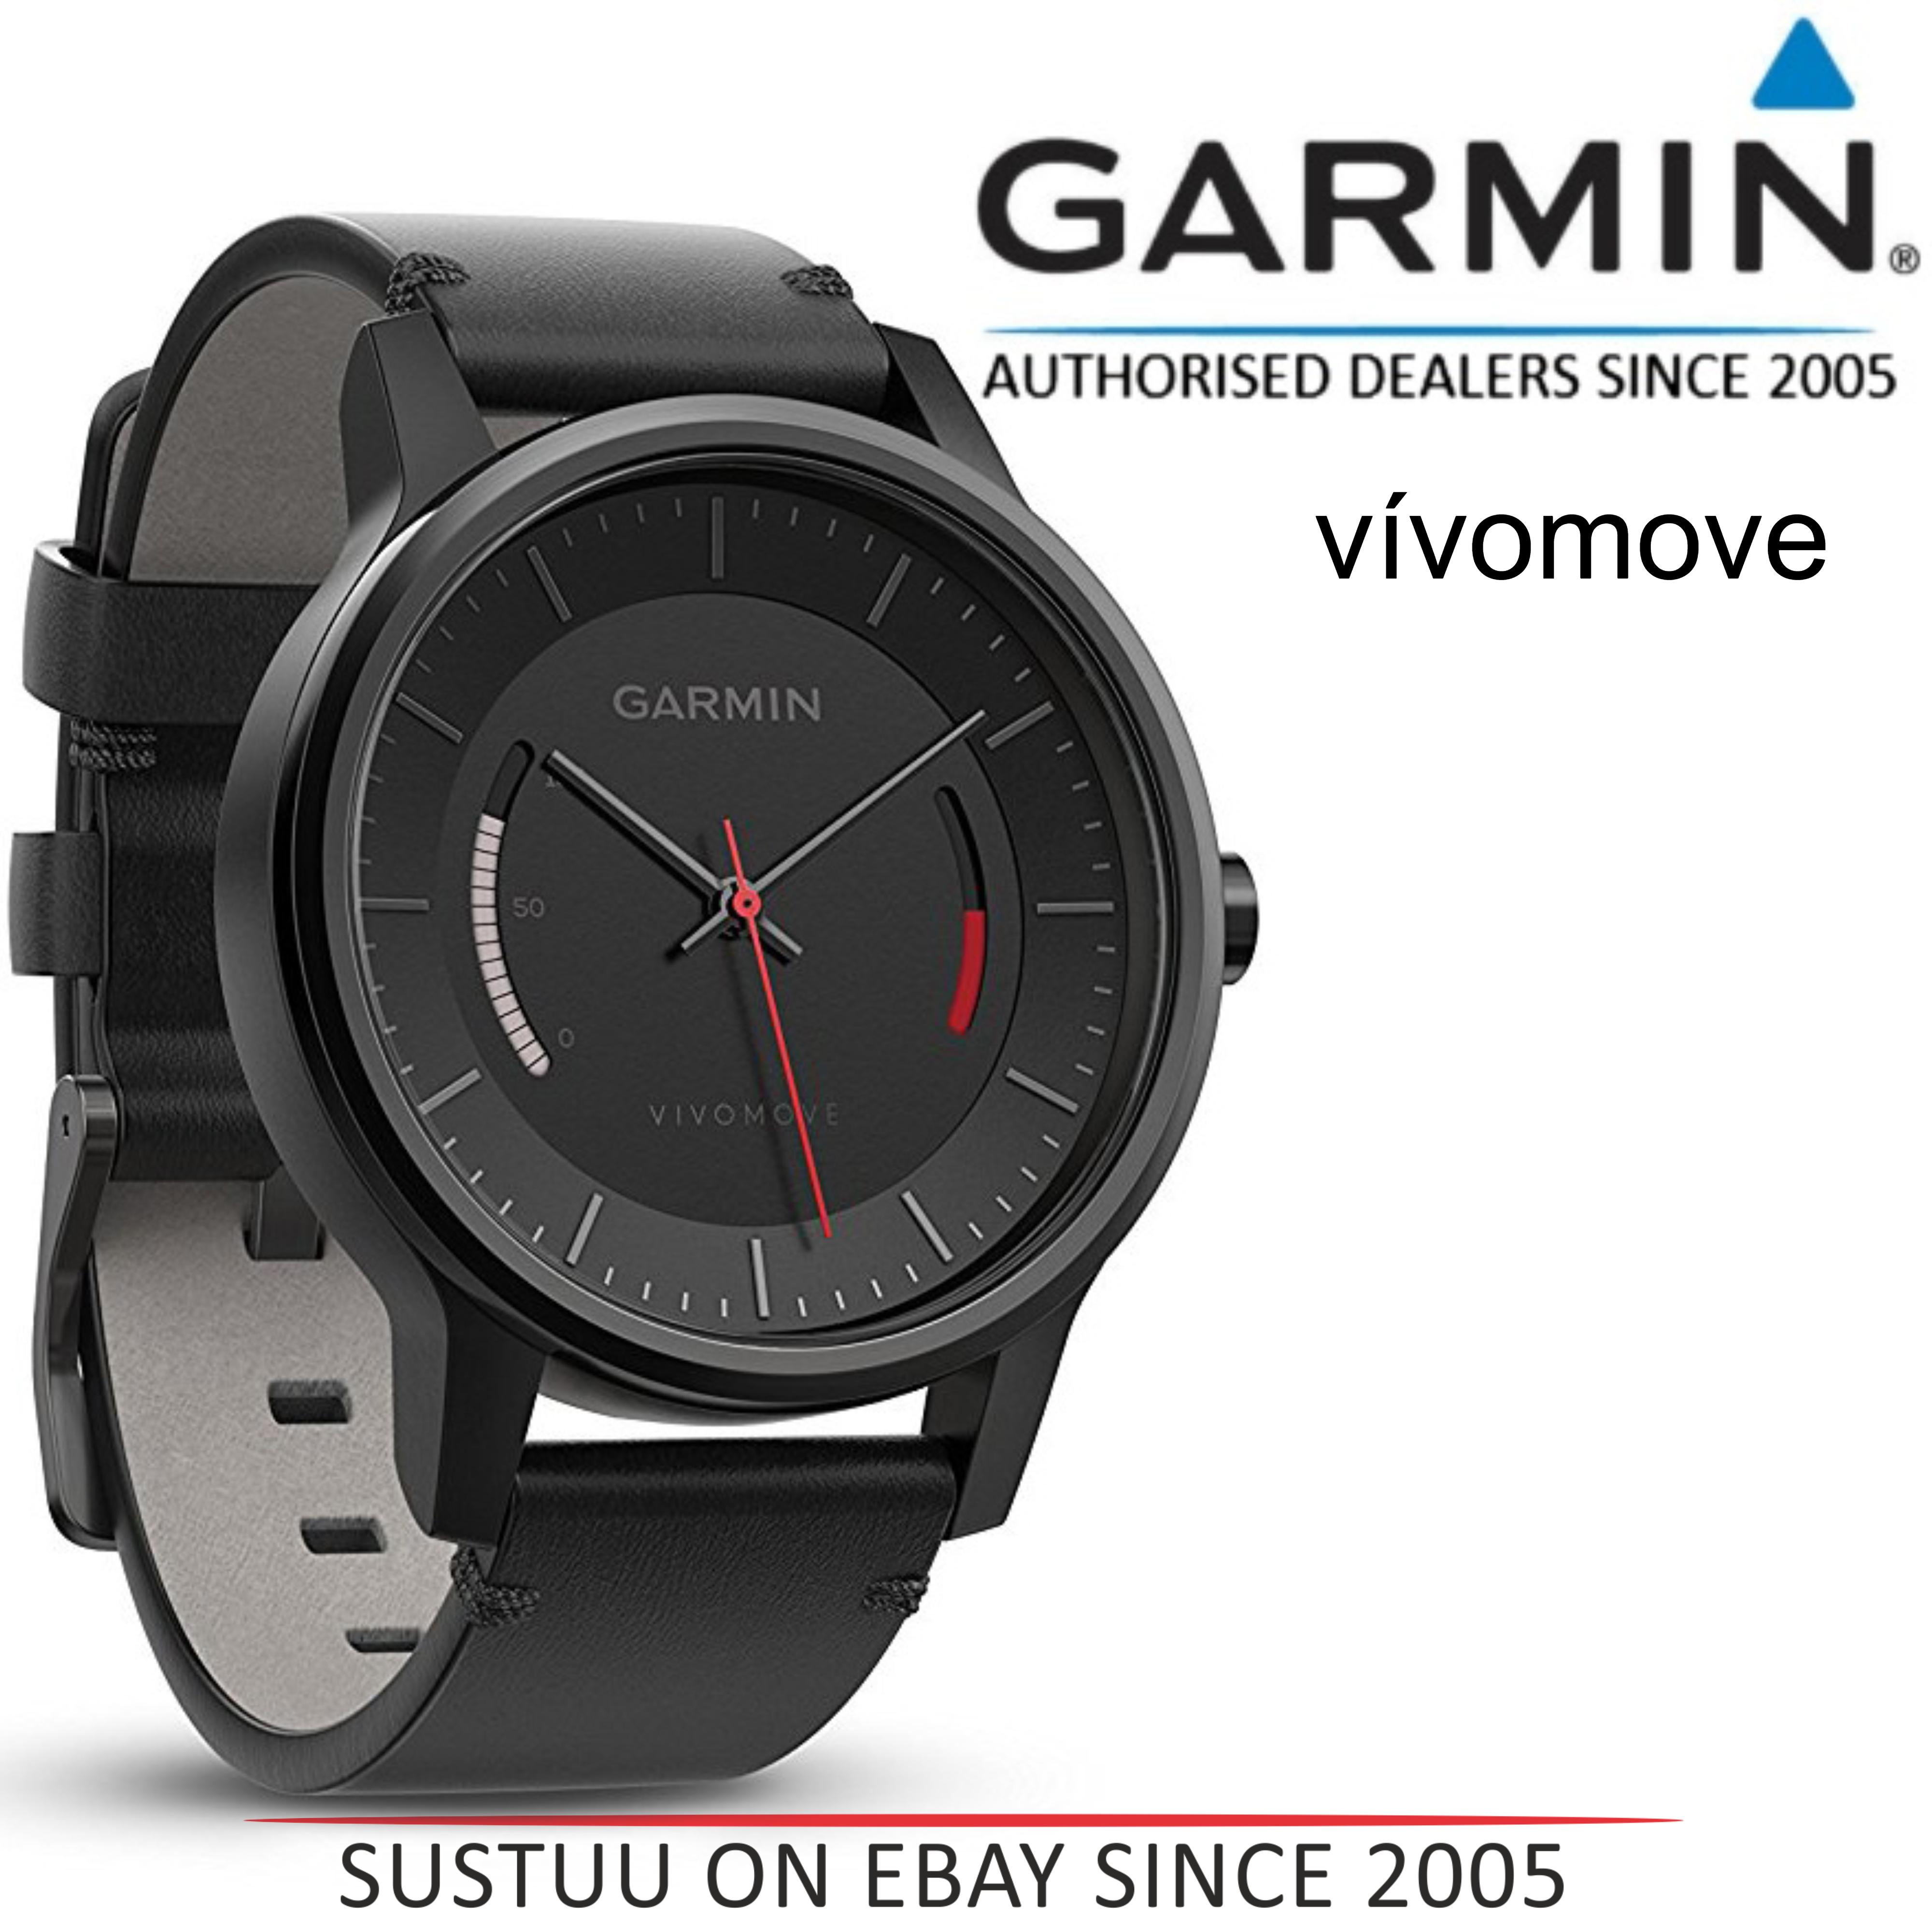 8f5a25b9ecb Sentinel Garmin Vivomove Classic Smart Watch│Activity Tracker│Sleep  Monitor│Black Leather